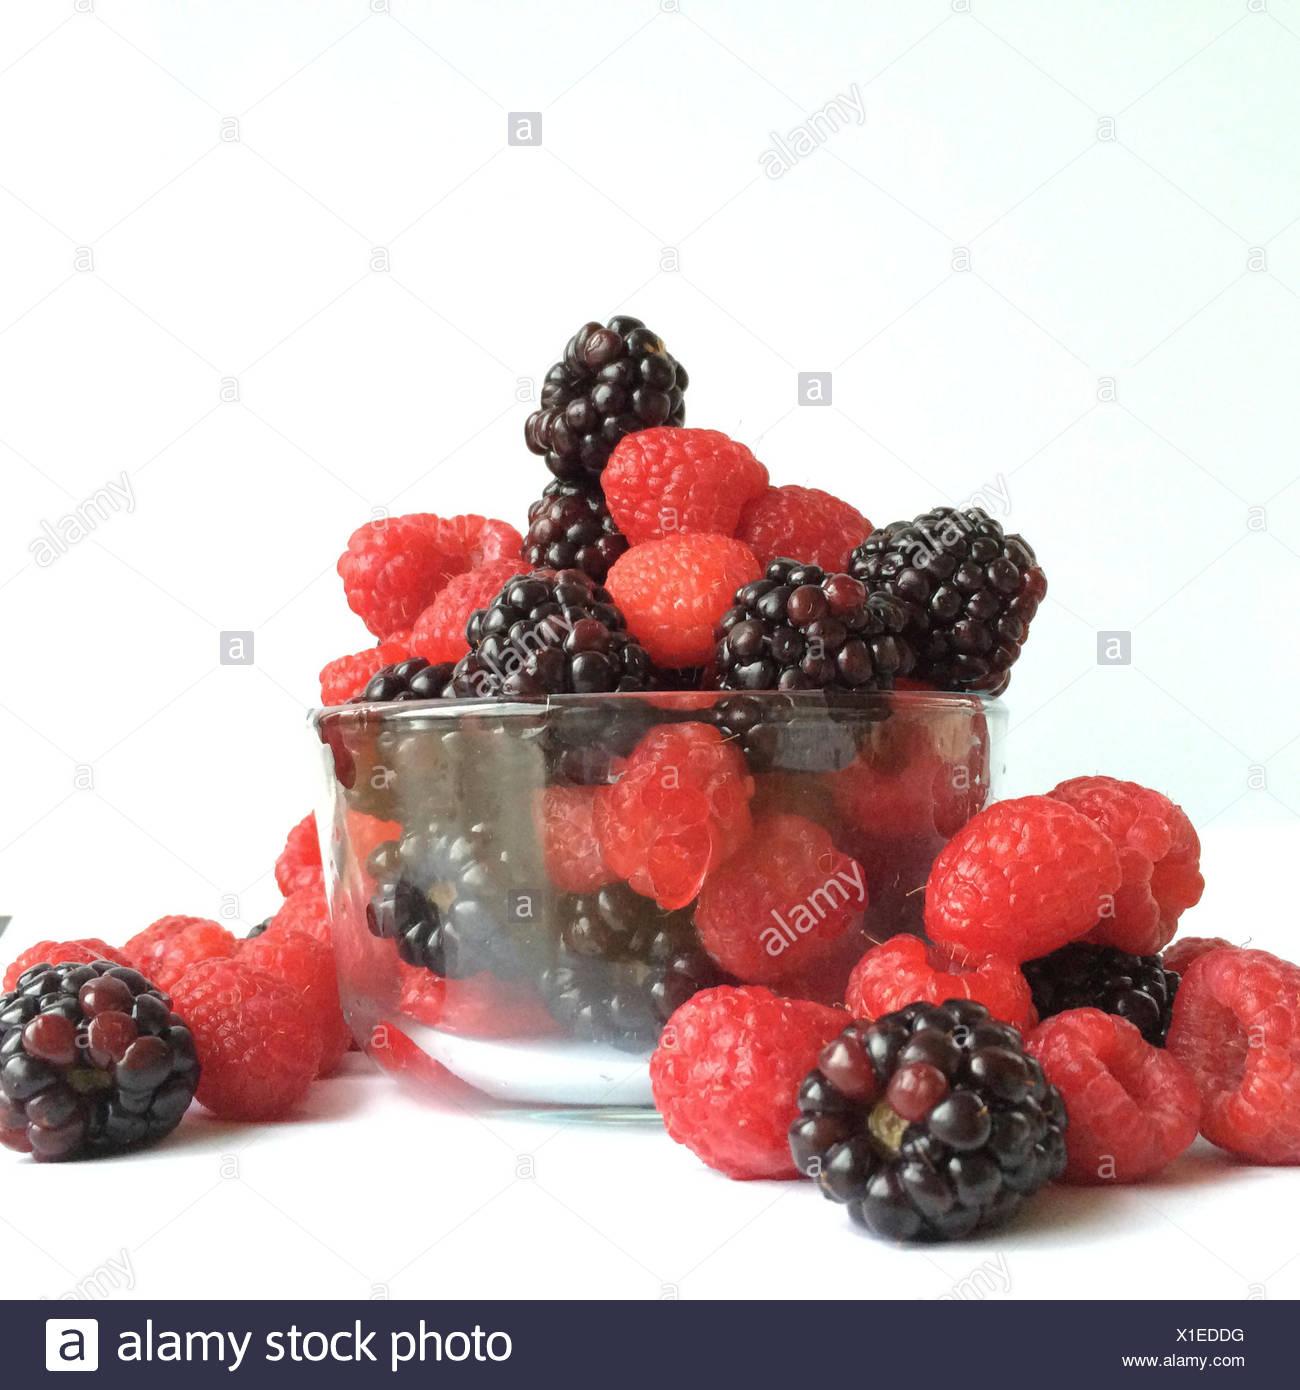 Glass bowl of raspberries and blackberries - Stock Image